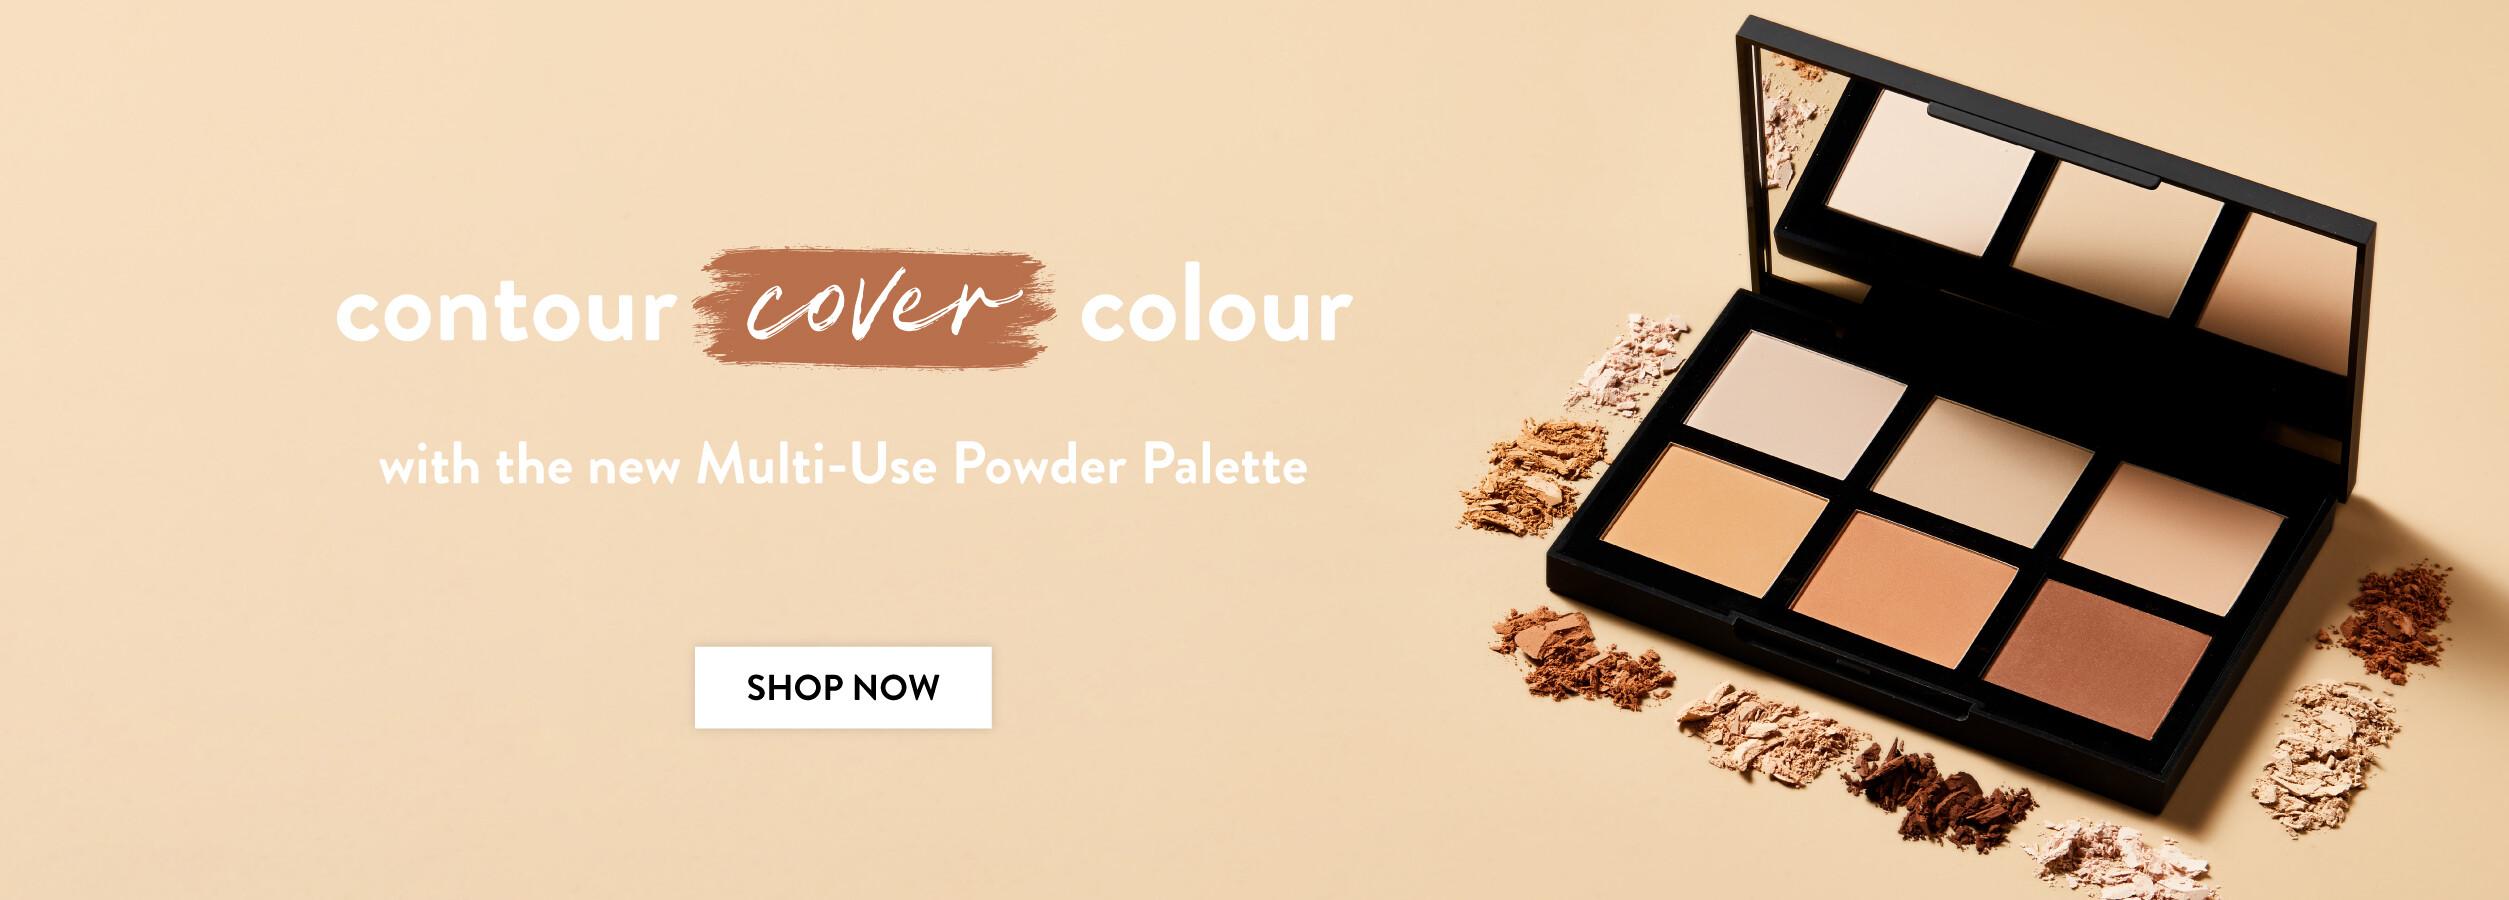 Multi-use Powder palette